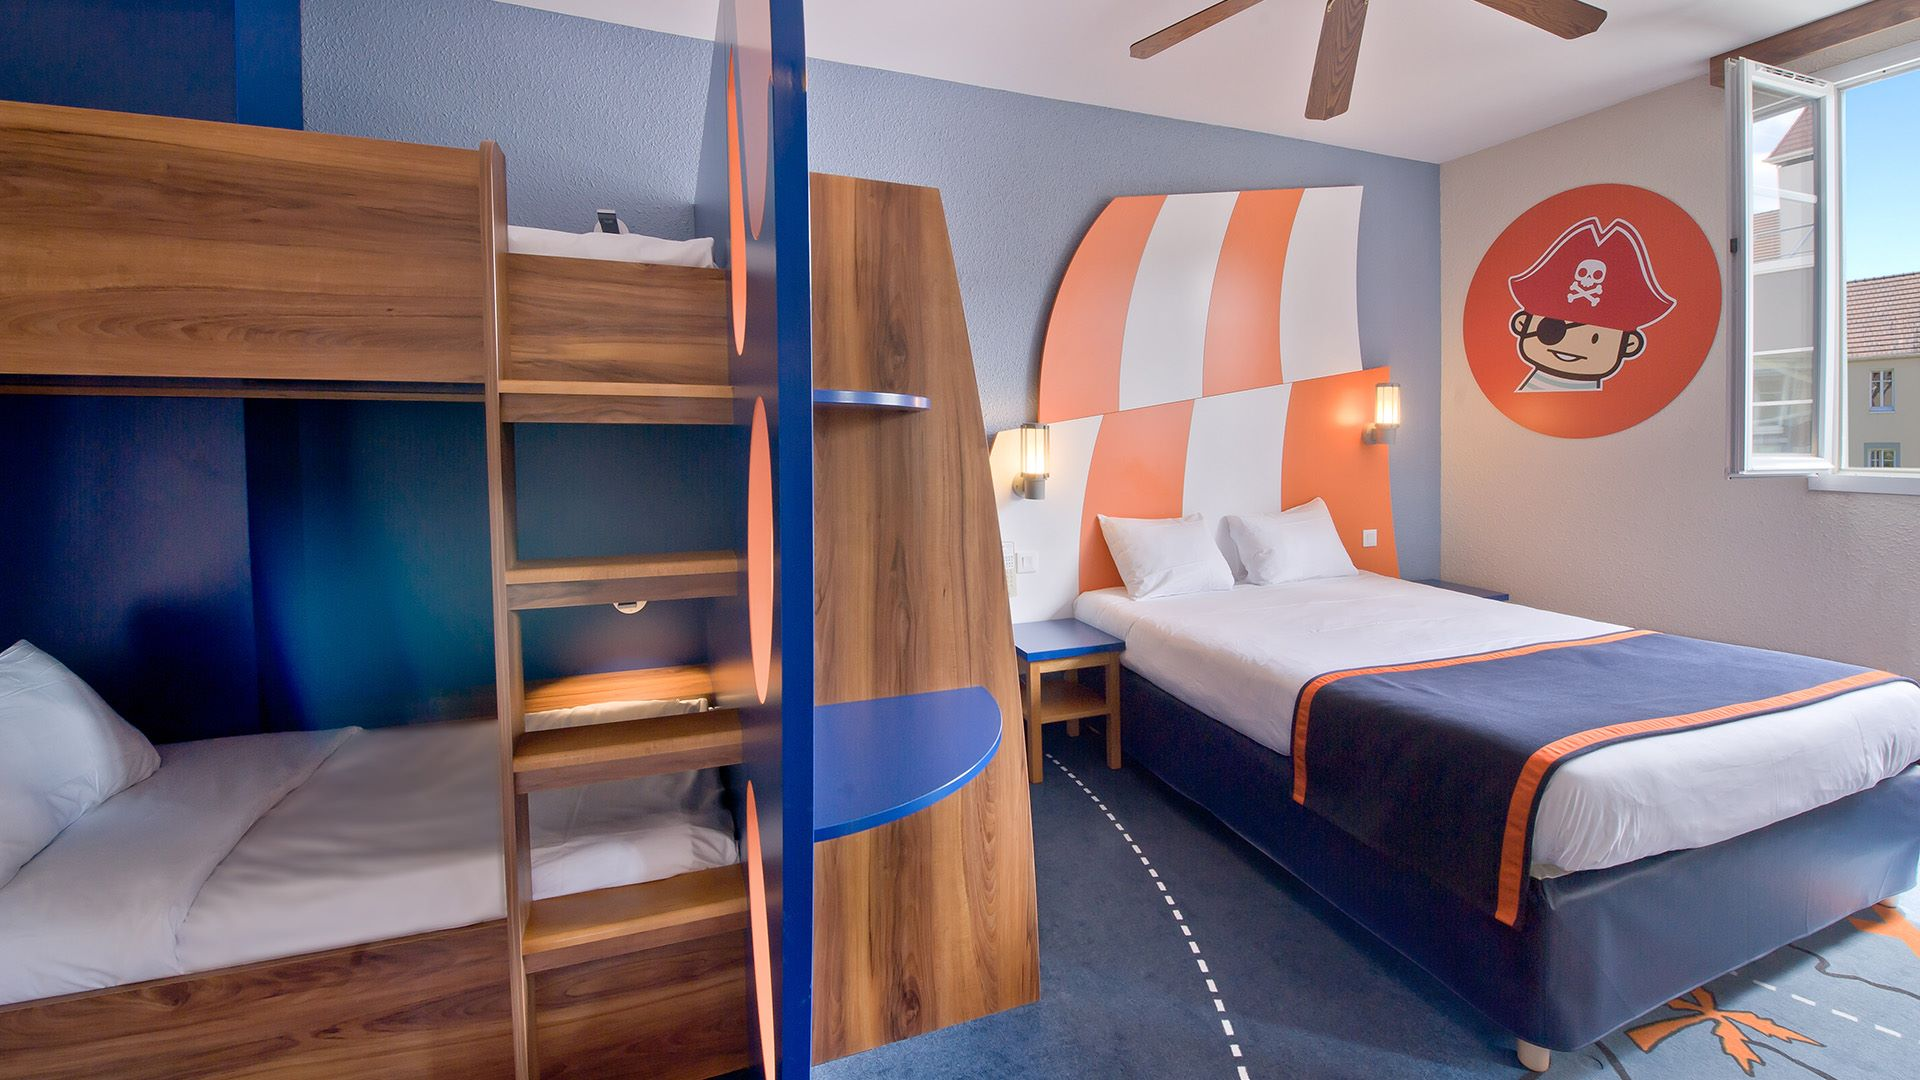 Family Room Hotel Disneyland Paris Hotel Explorers For